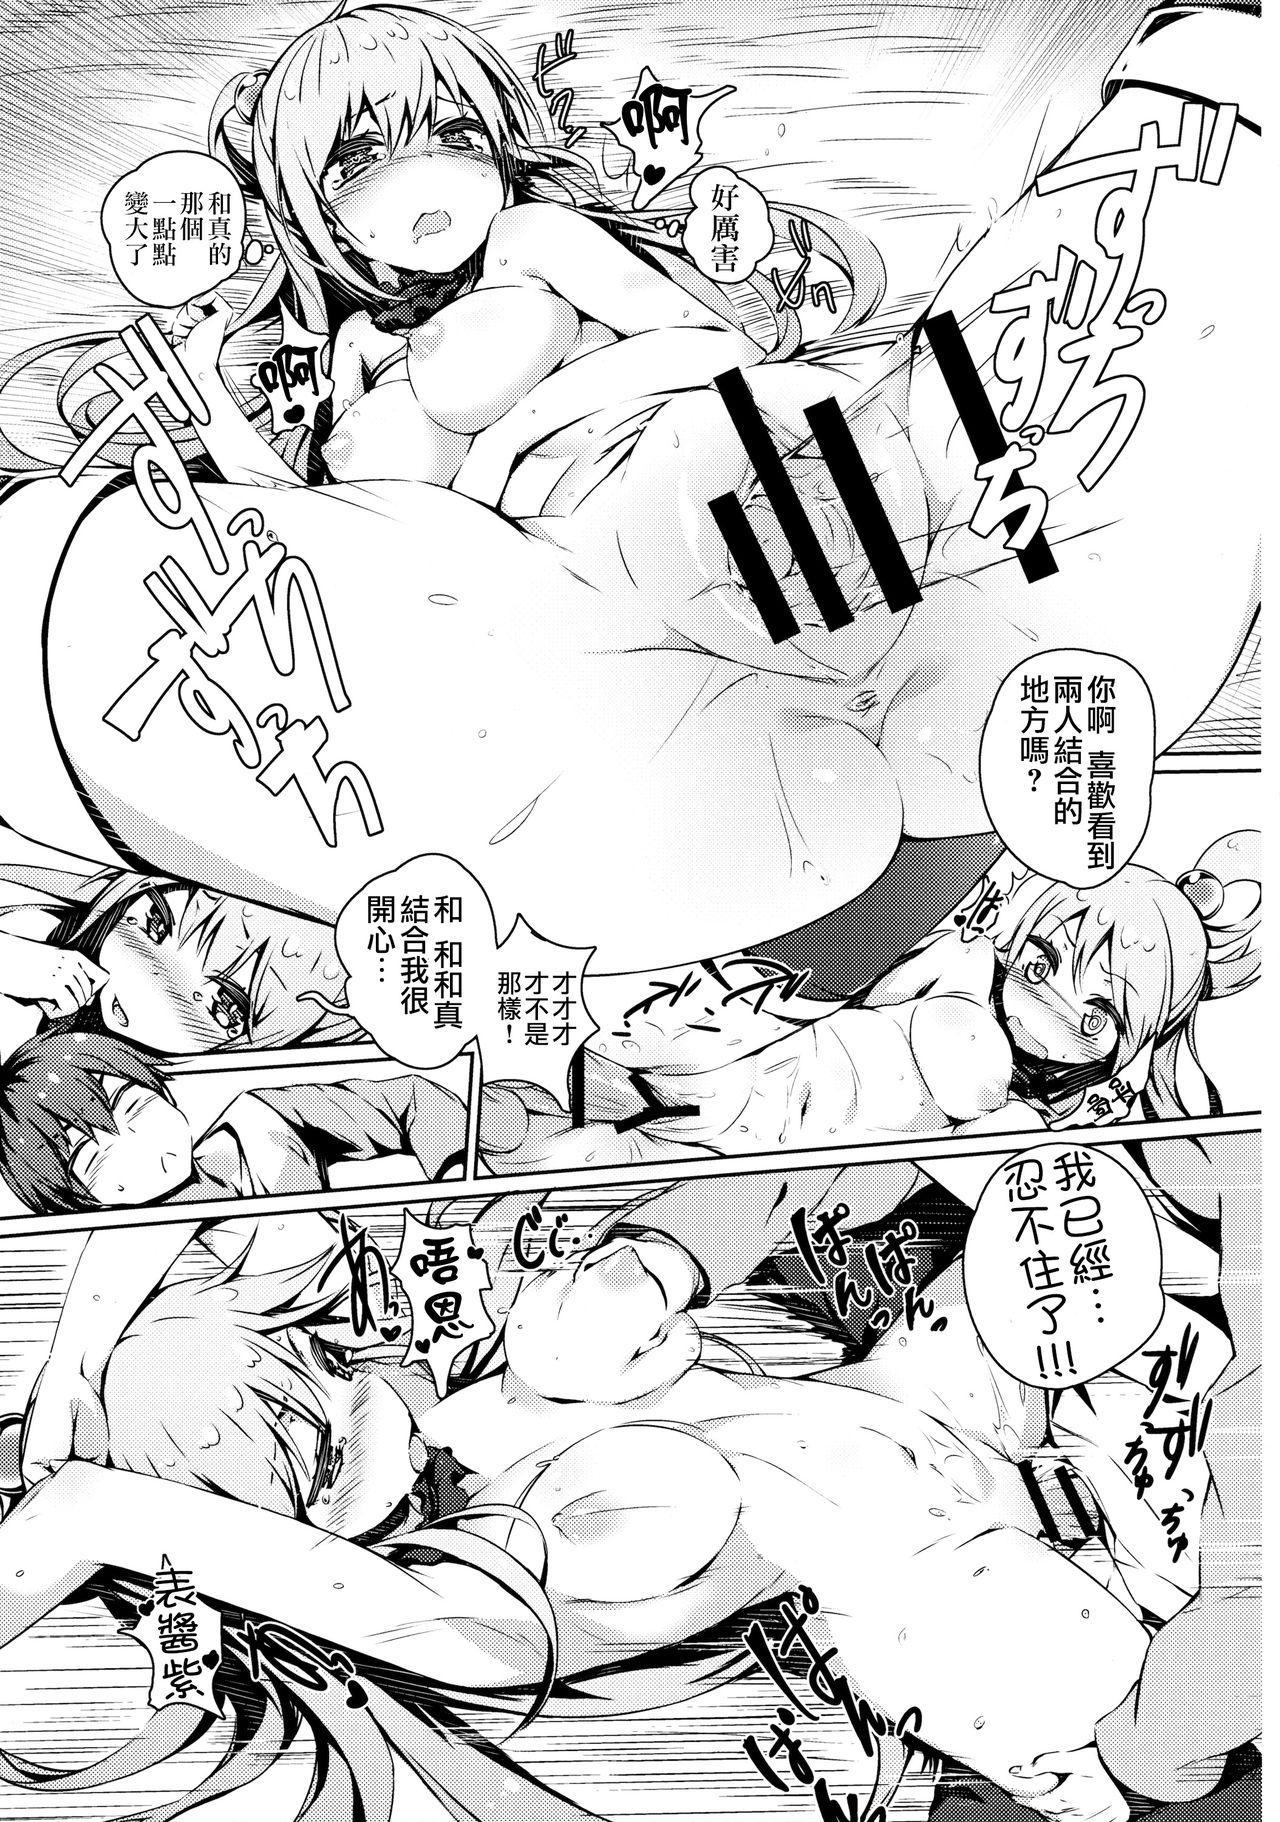 Kono Nikutarashii Megami no Icha Love o! | 為這個討厭的女神獻上卿卿我我! 20